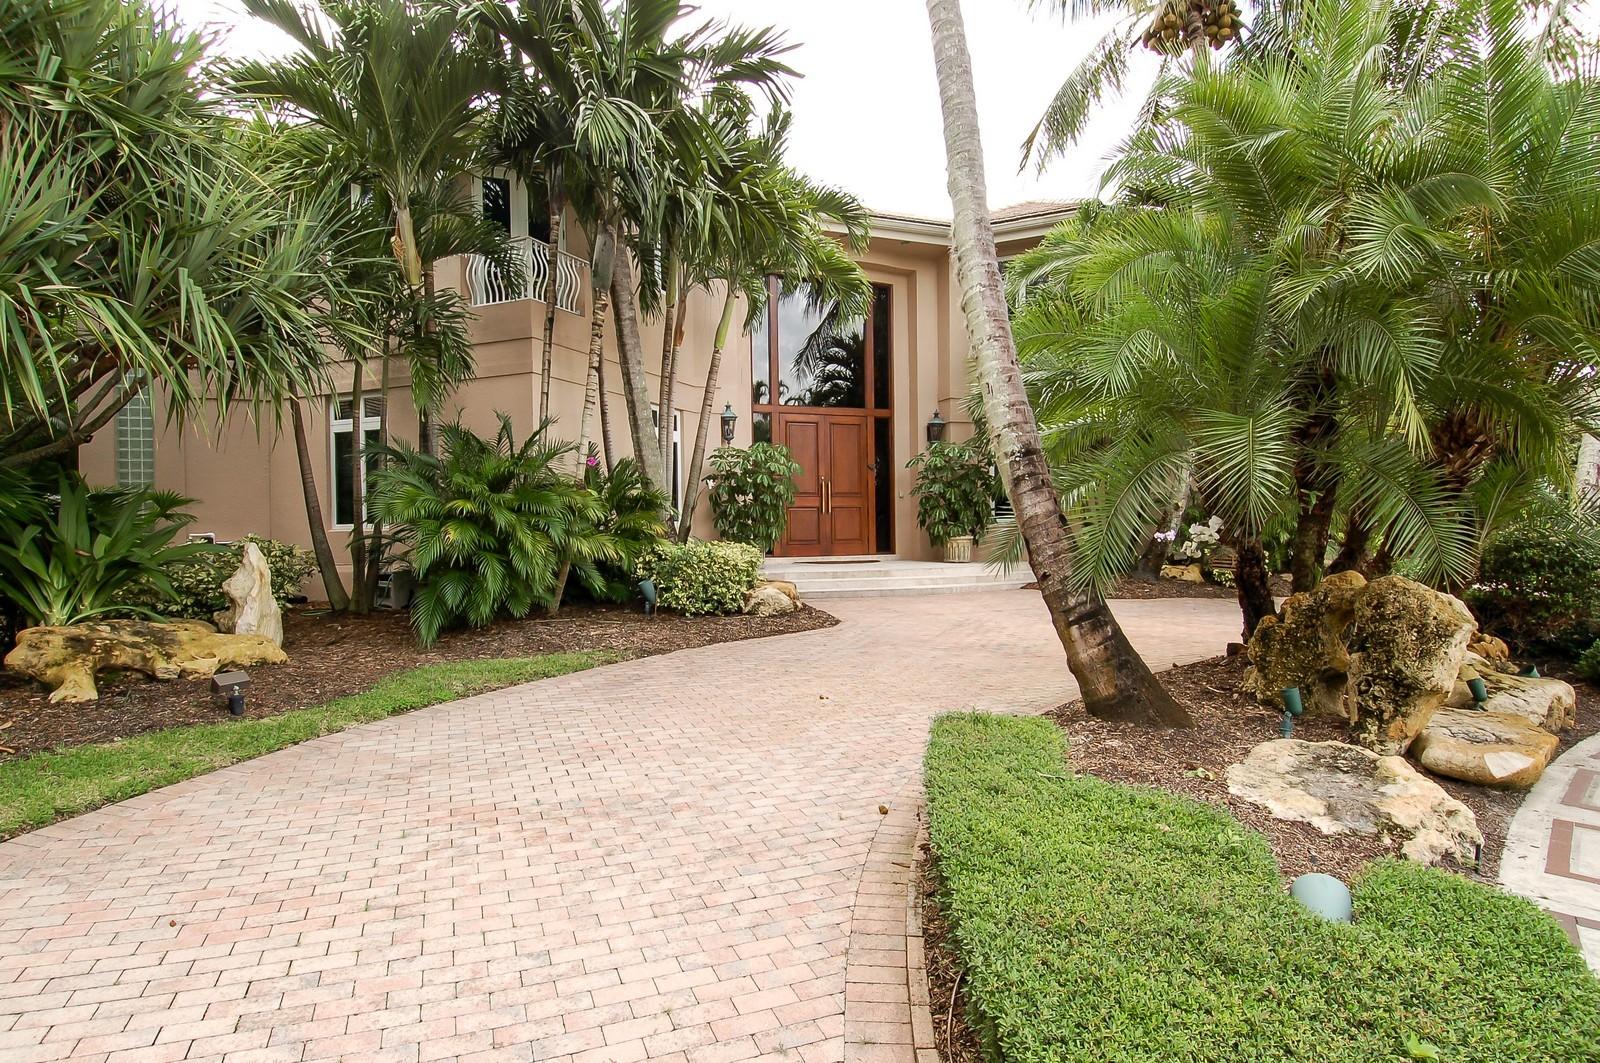 Real Estate Photography - 19674 OakbrookCourt, Boca Raton, FL, 33434 - Front View